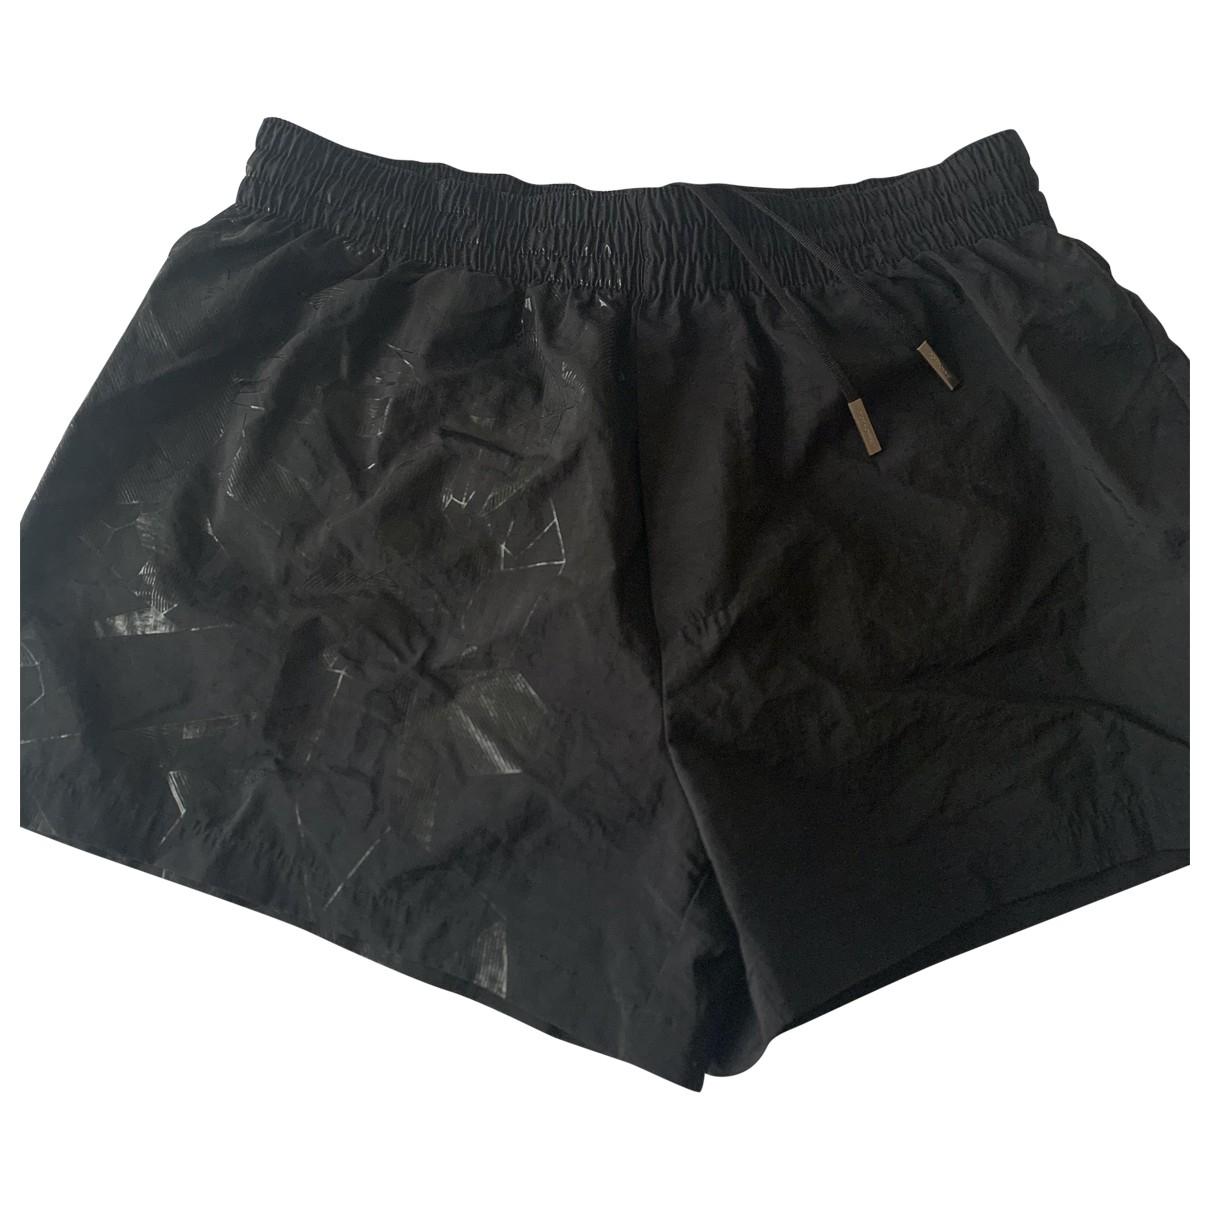 Dior Homme N Black Swimwear for Men 46 IT